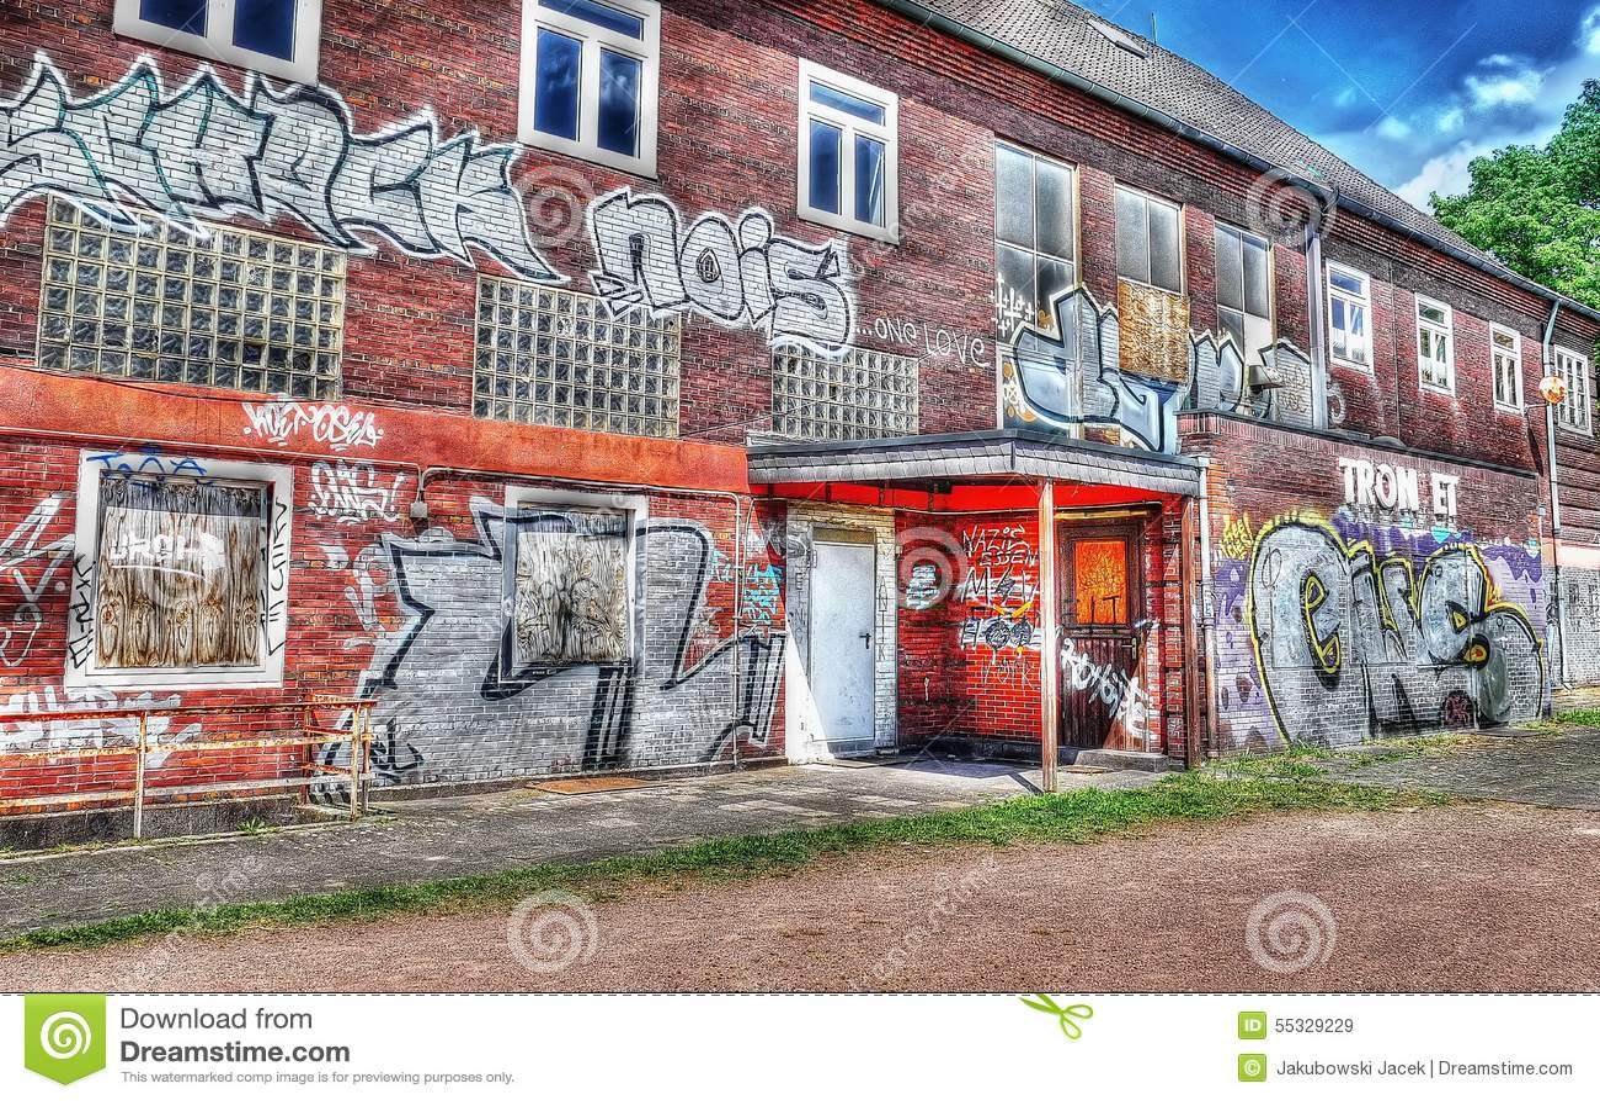 Graffiti Duisburg graffiti station duisburg trompet germany editorial stock